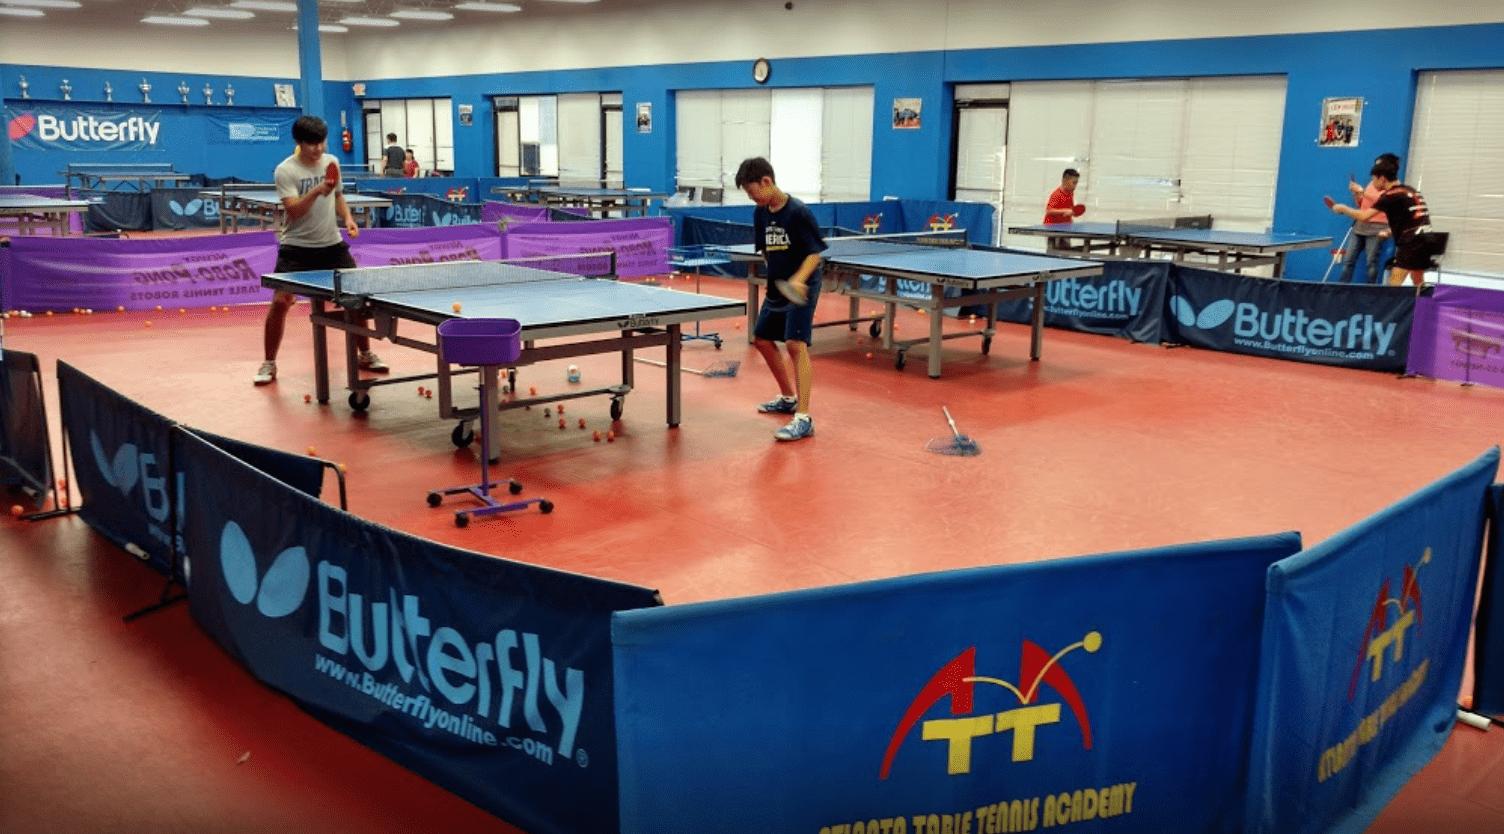 WAB CLUB FEATURE: Atlanta International Table Tennis Academy